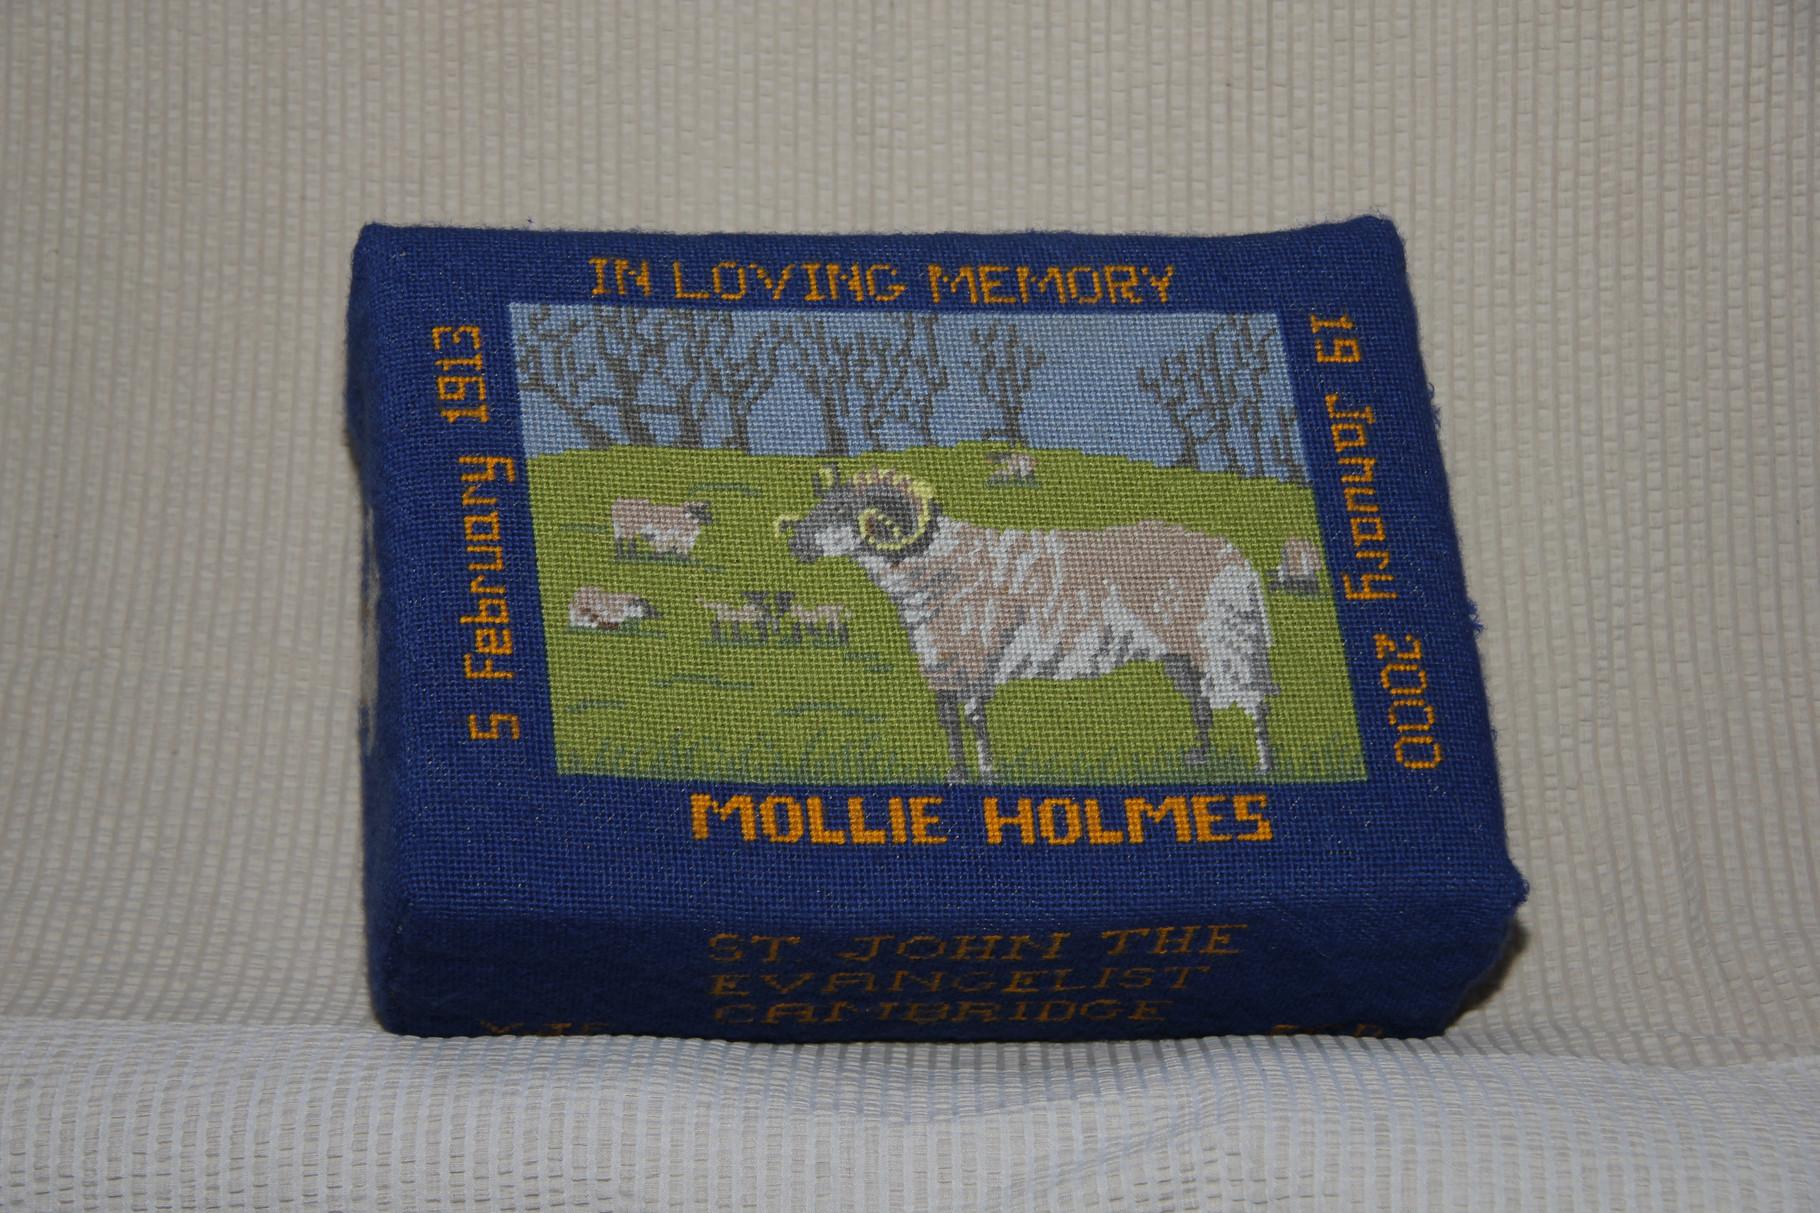 49. Farm: in loving memory of Mollie Holmes (1913-2000)